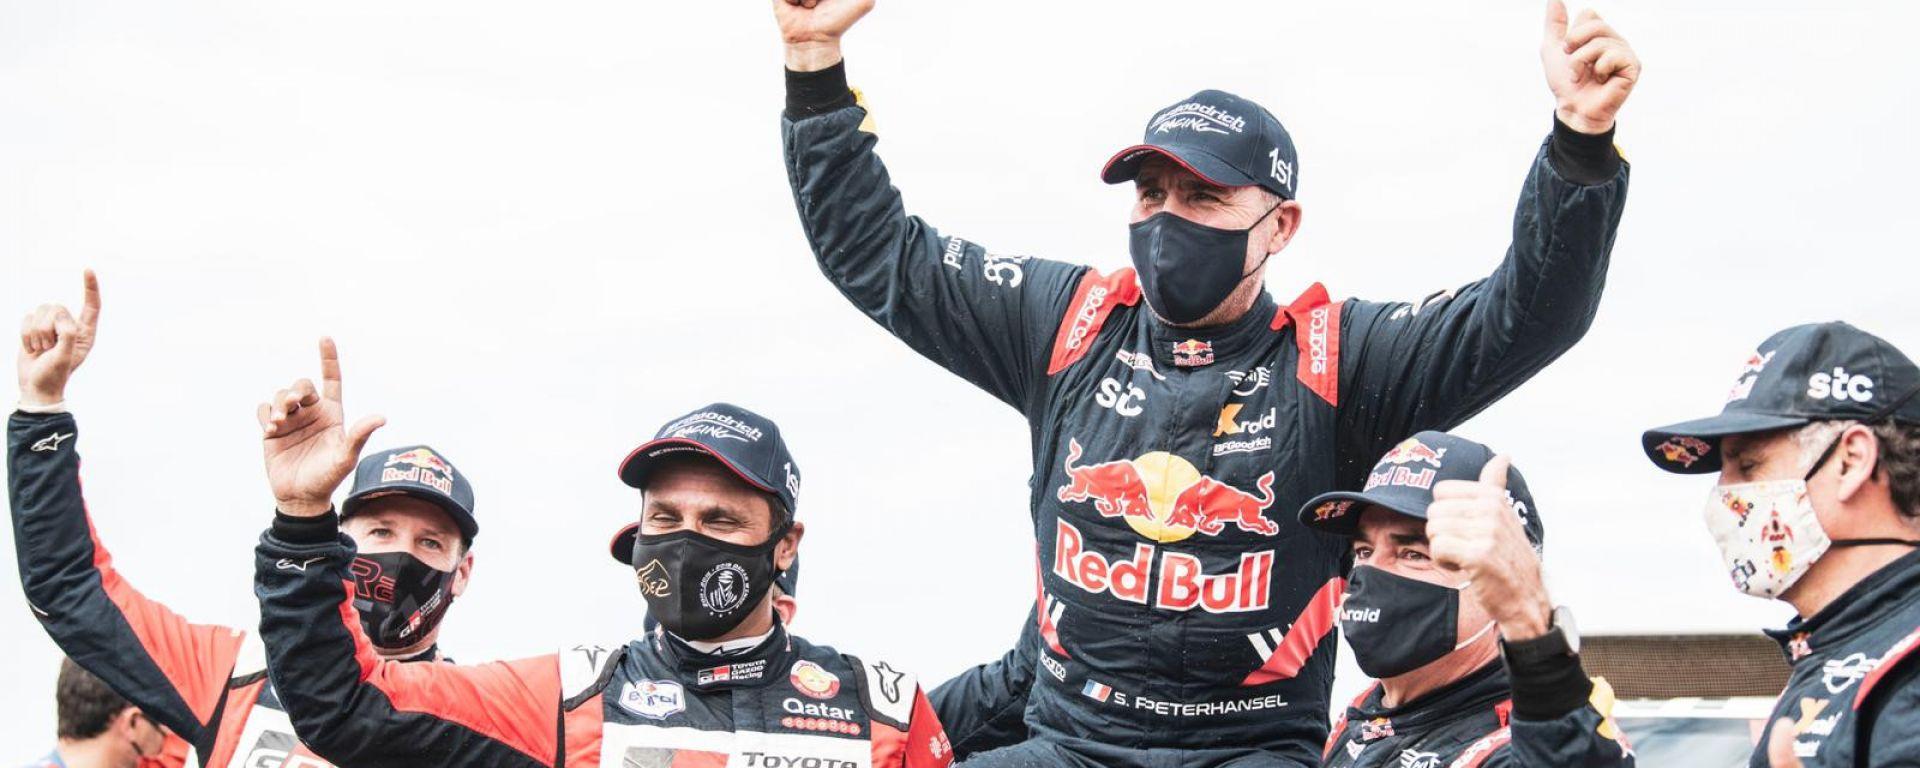 Dakar Auto 2021: il podio con Nasser Al-Attiyah (Toyota), Stephane Peterhansel (Mini) e Carlos Sainz (Mini)